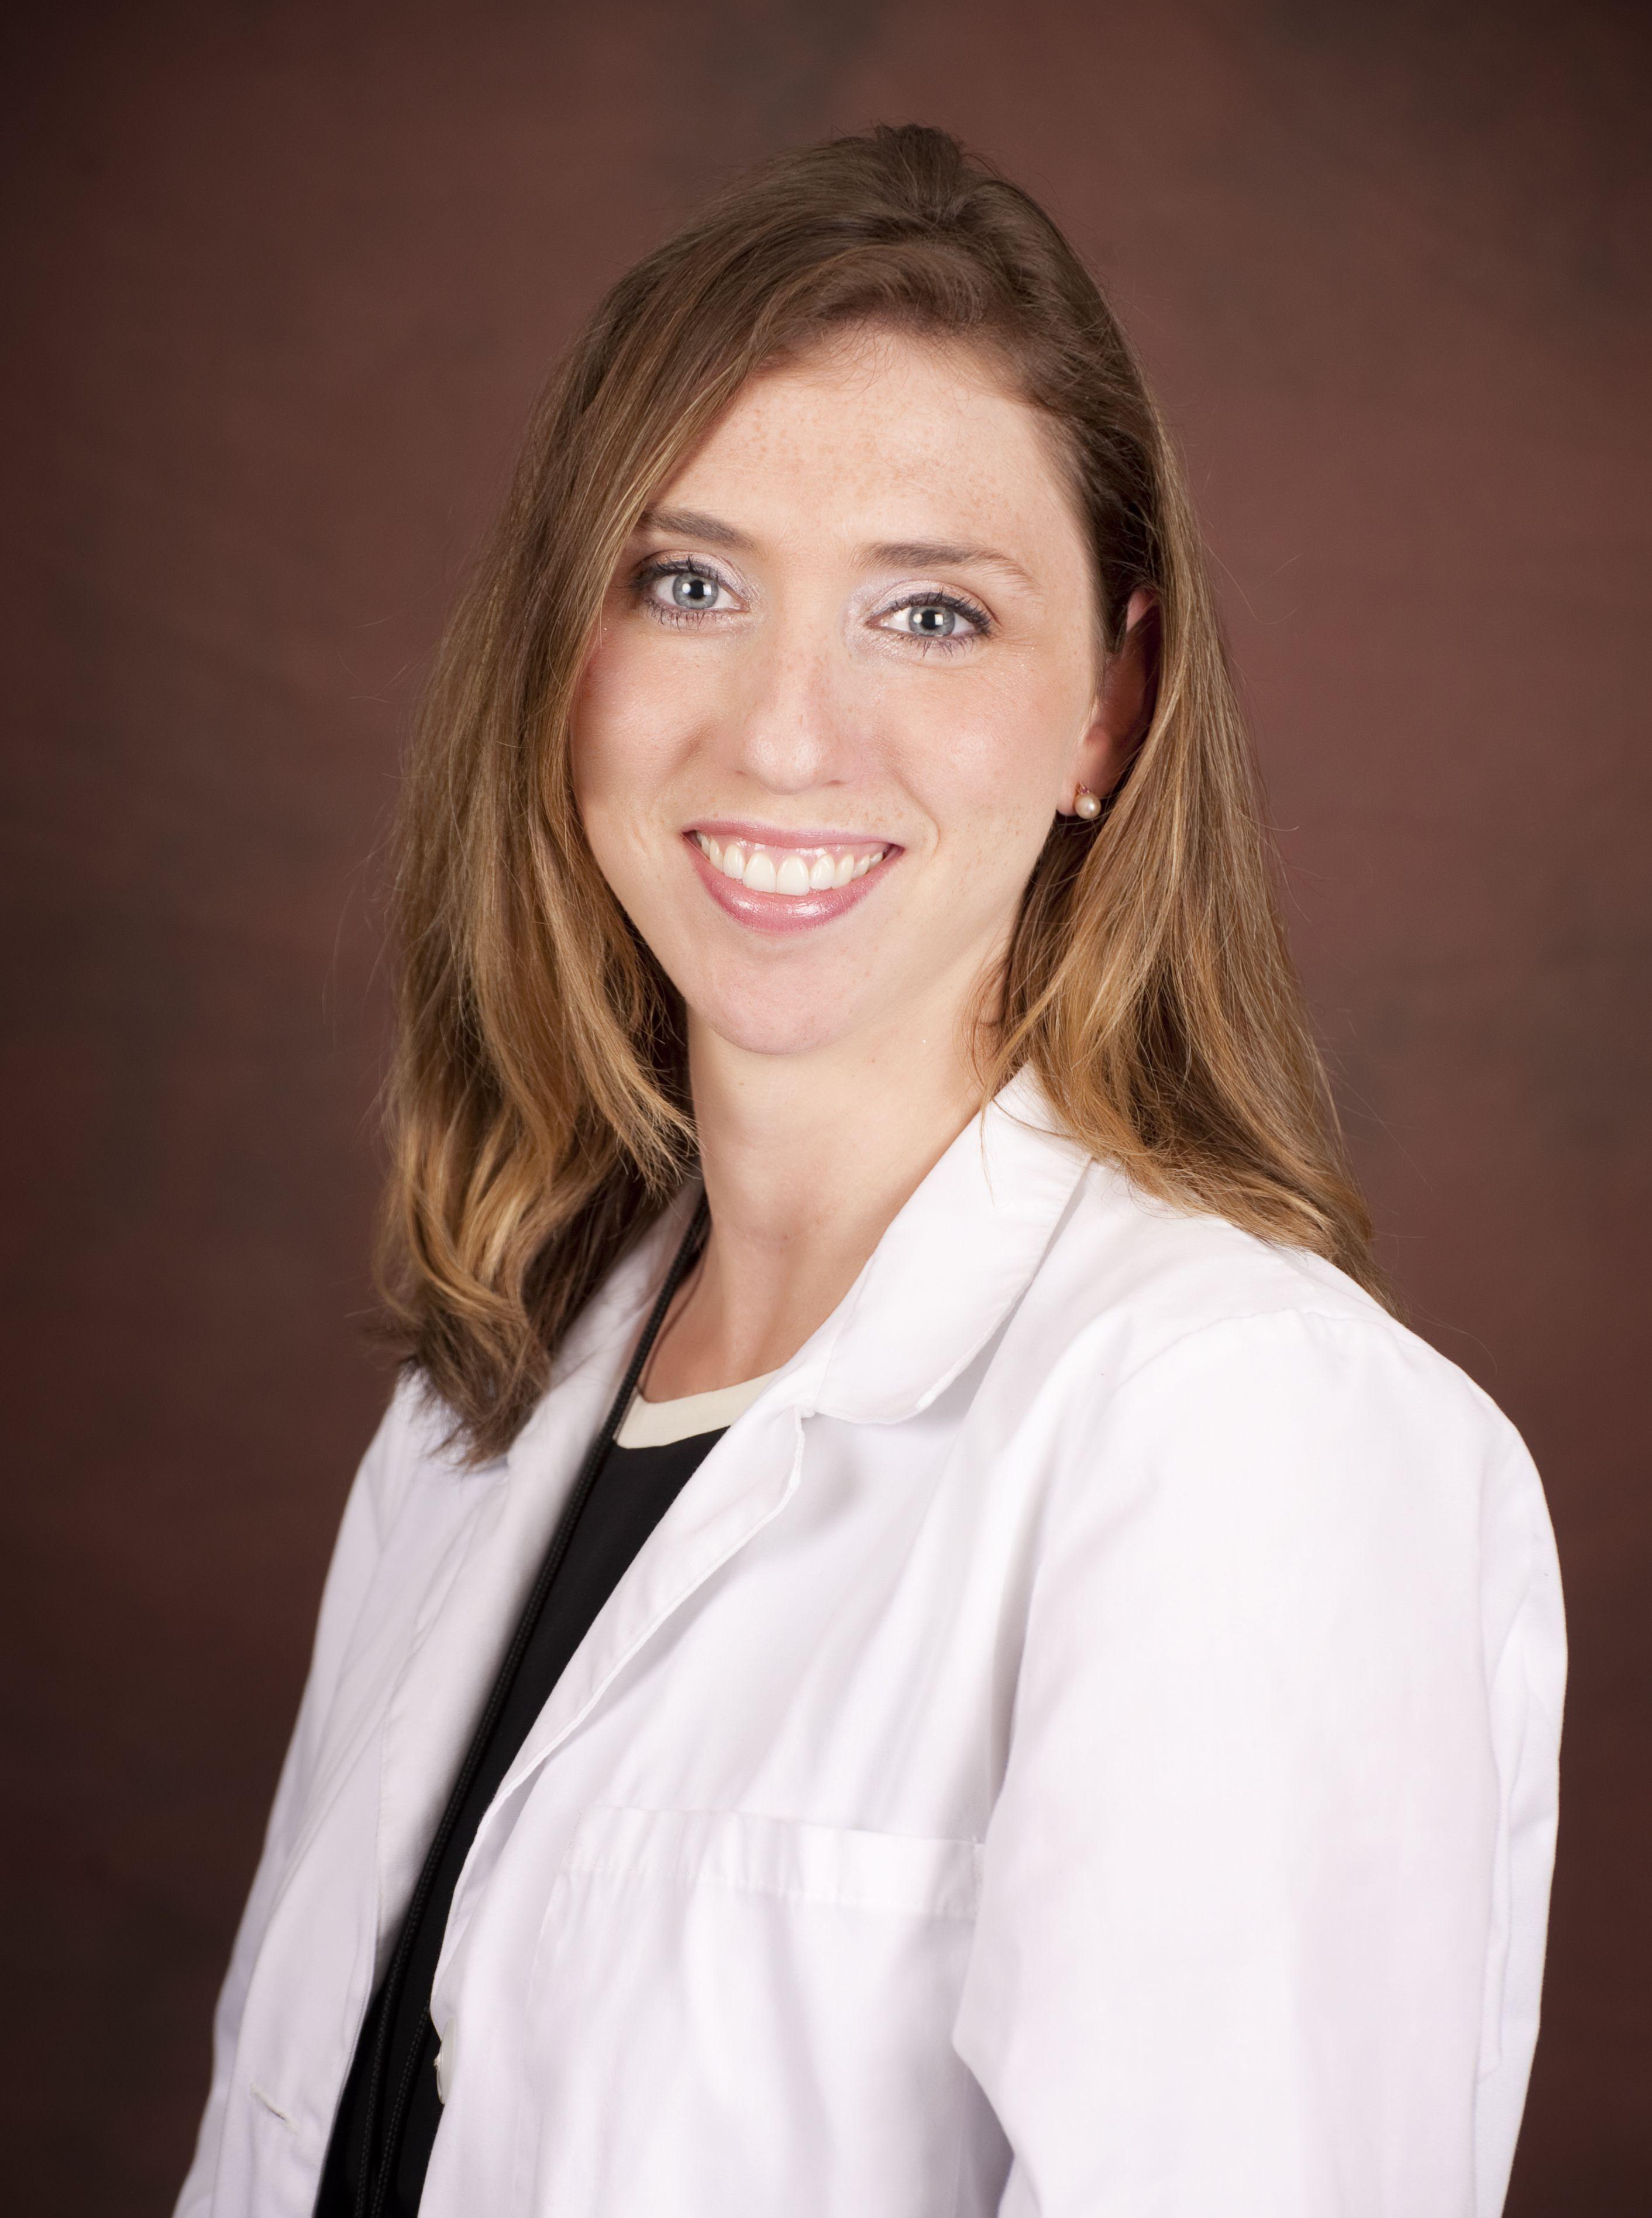 Julia levenson fnpc is a certified family nurse